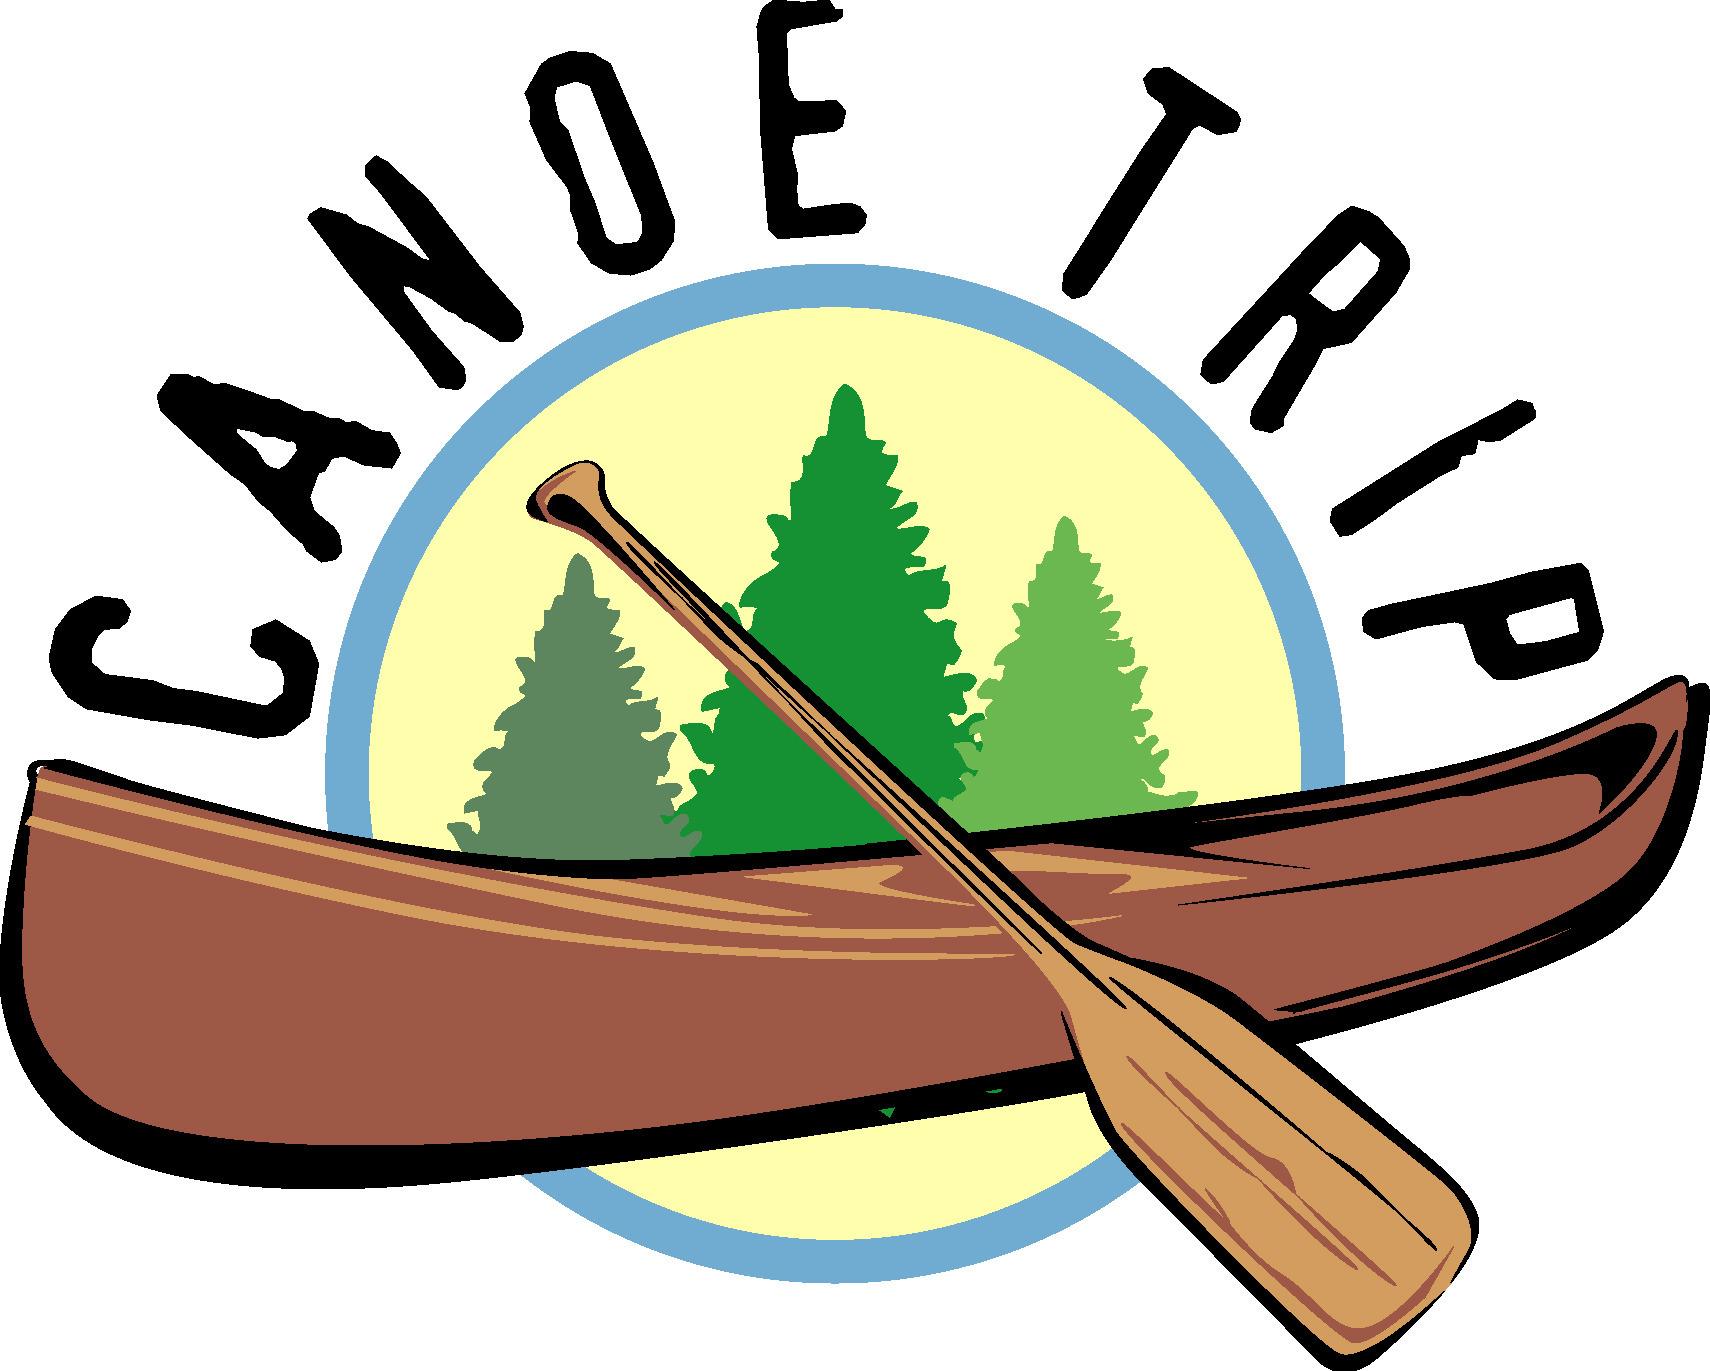 Canoe clipart canoe trip, Canoe canoe trip Transparent FREE.